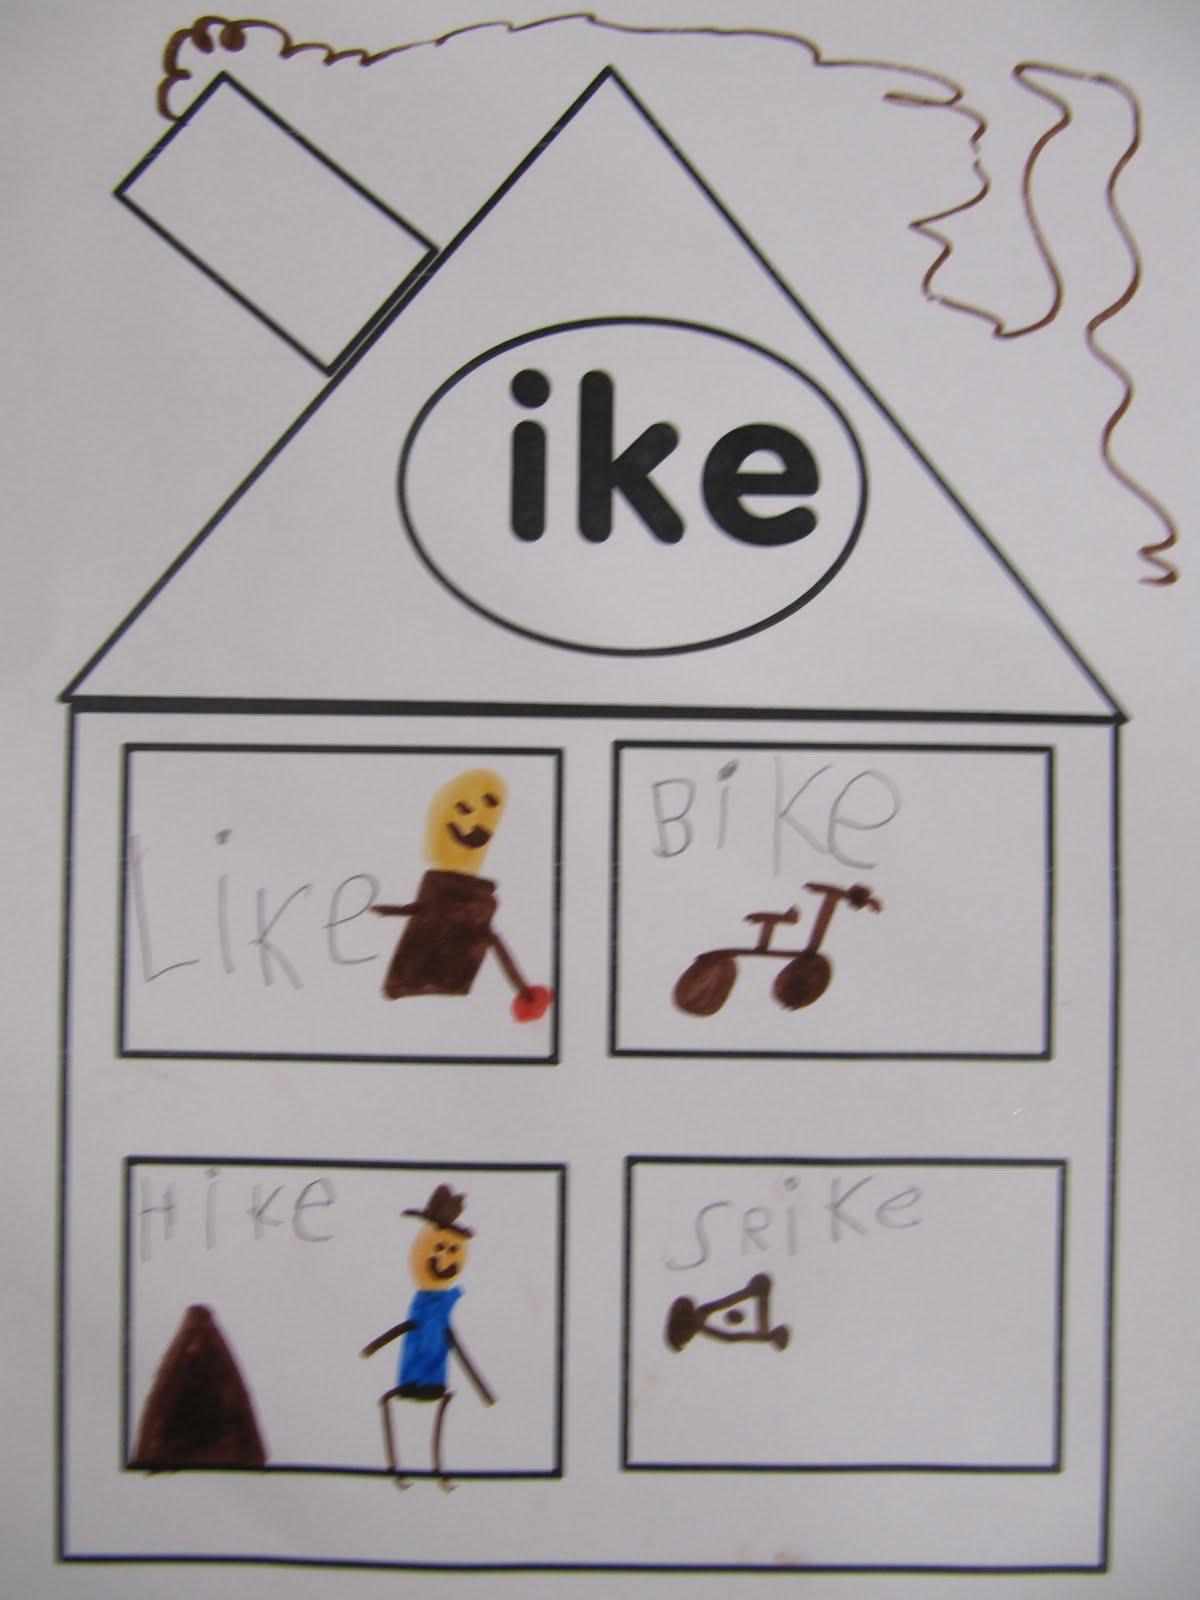 Kc Kindergarten Times The Ike Family